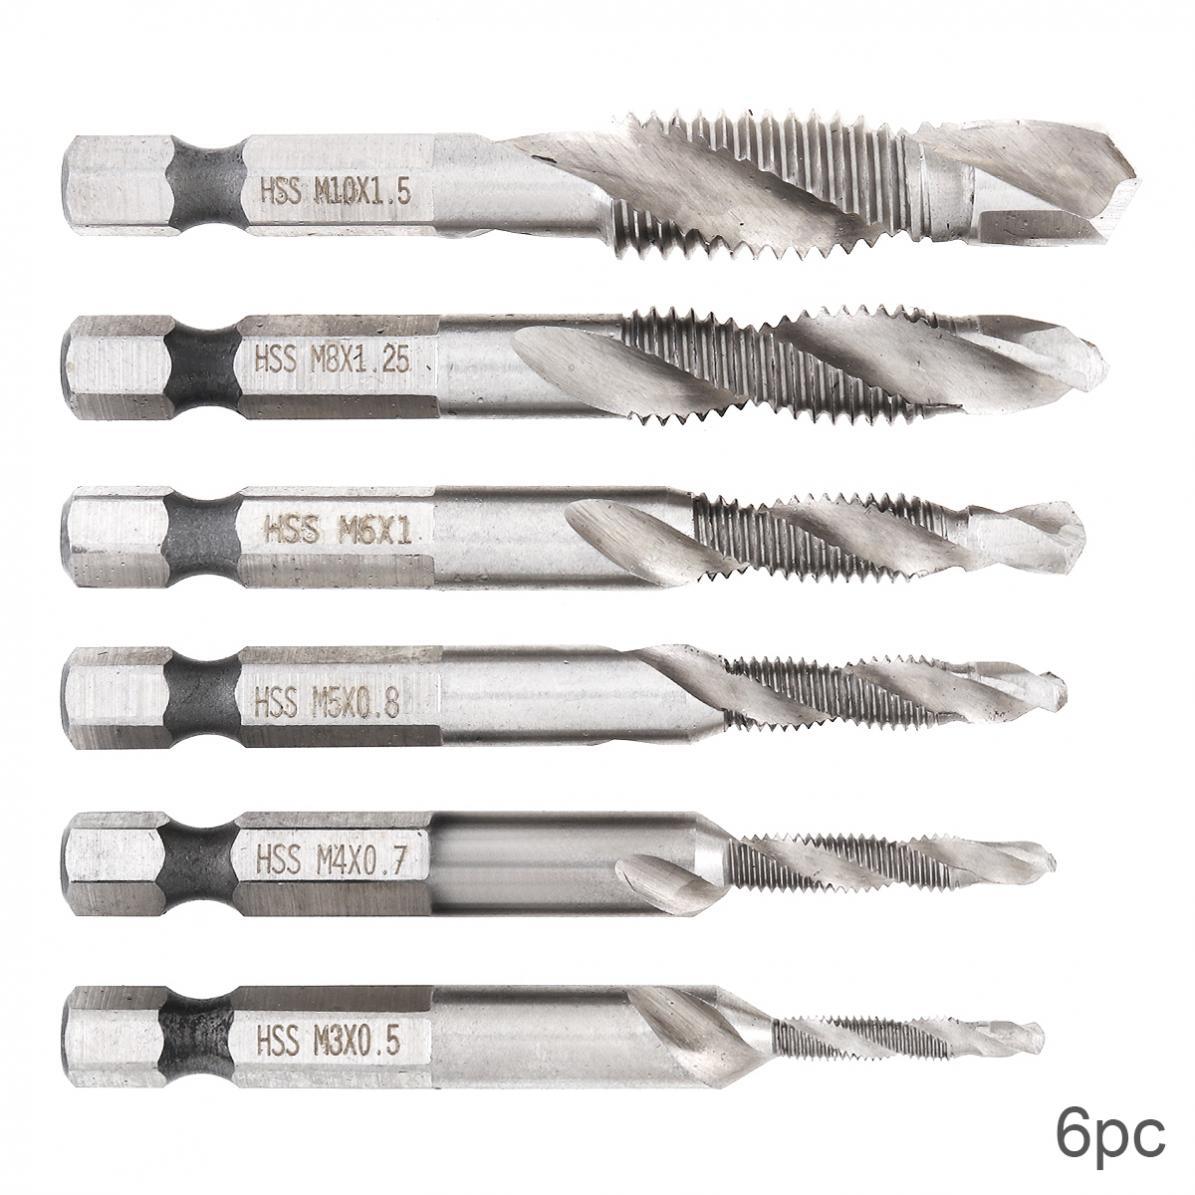 6 unids/set brocas de acero de alta velocidad caña hexagonal HSS tornillo punta rosca métrica taladro macho apto para broca